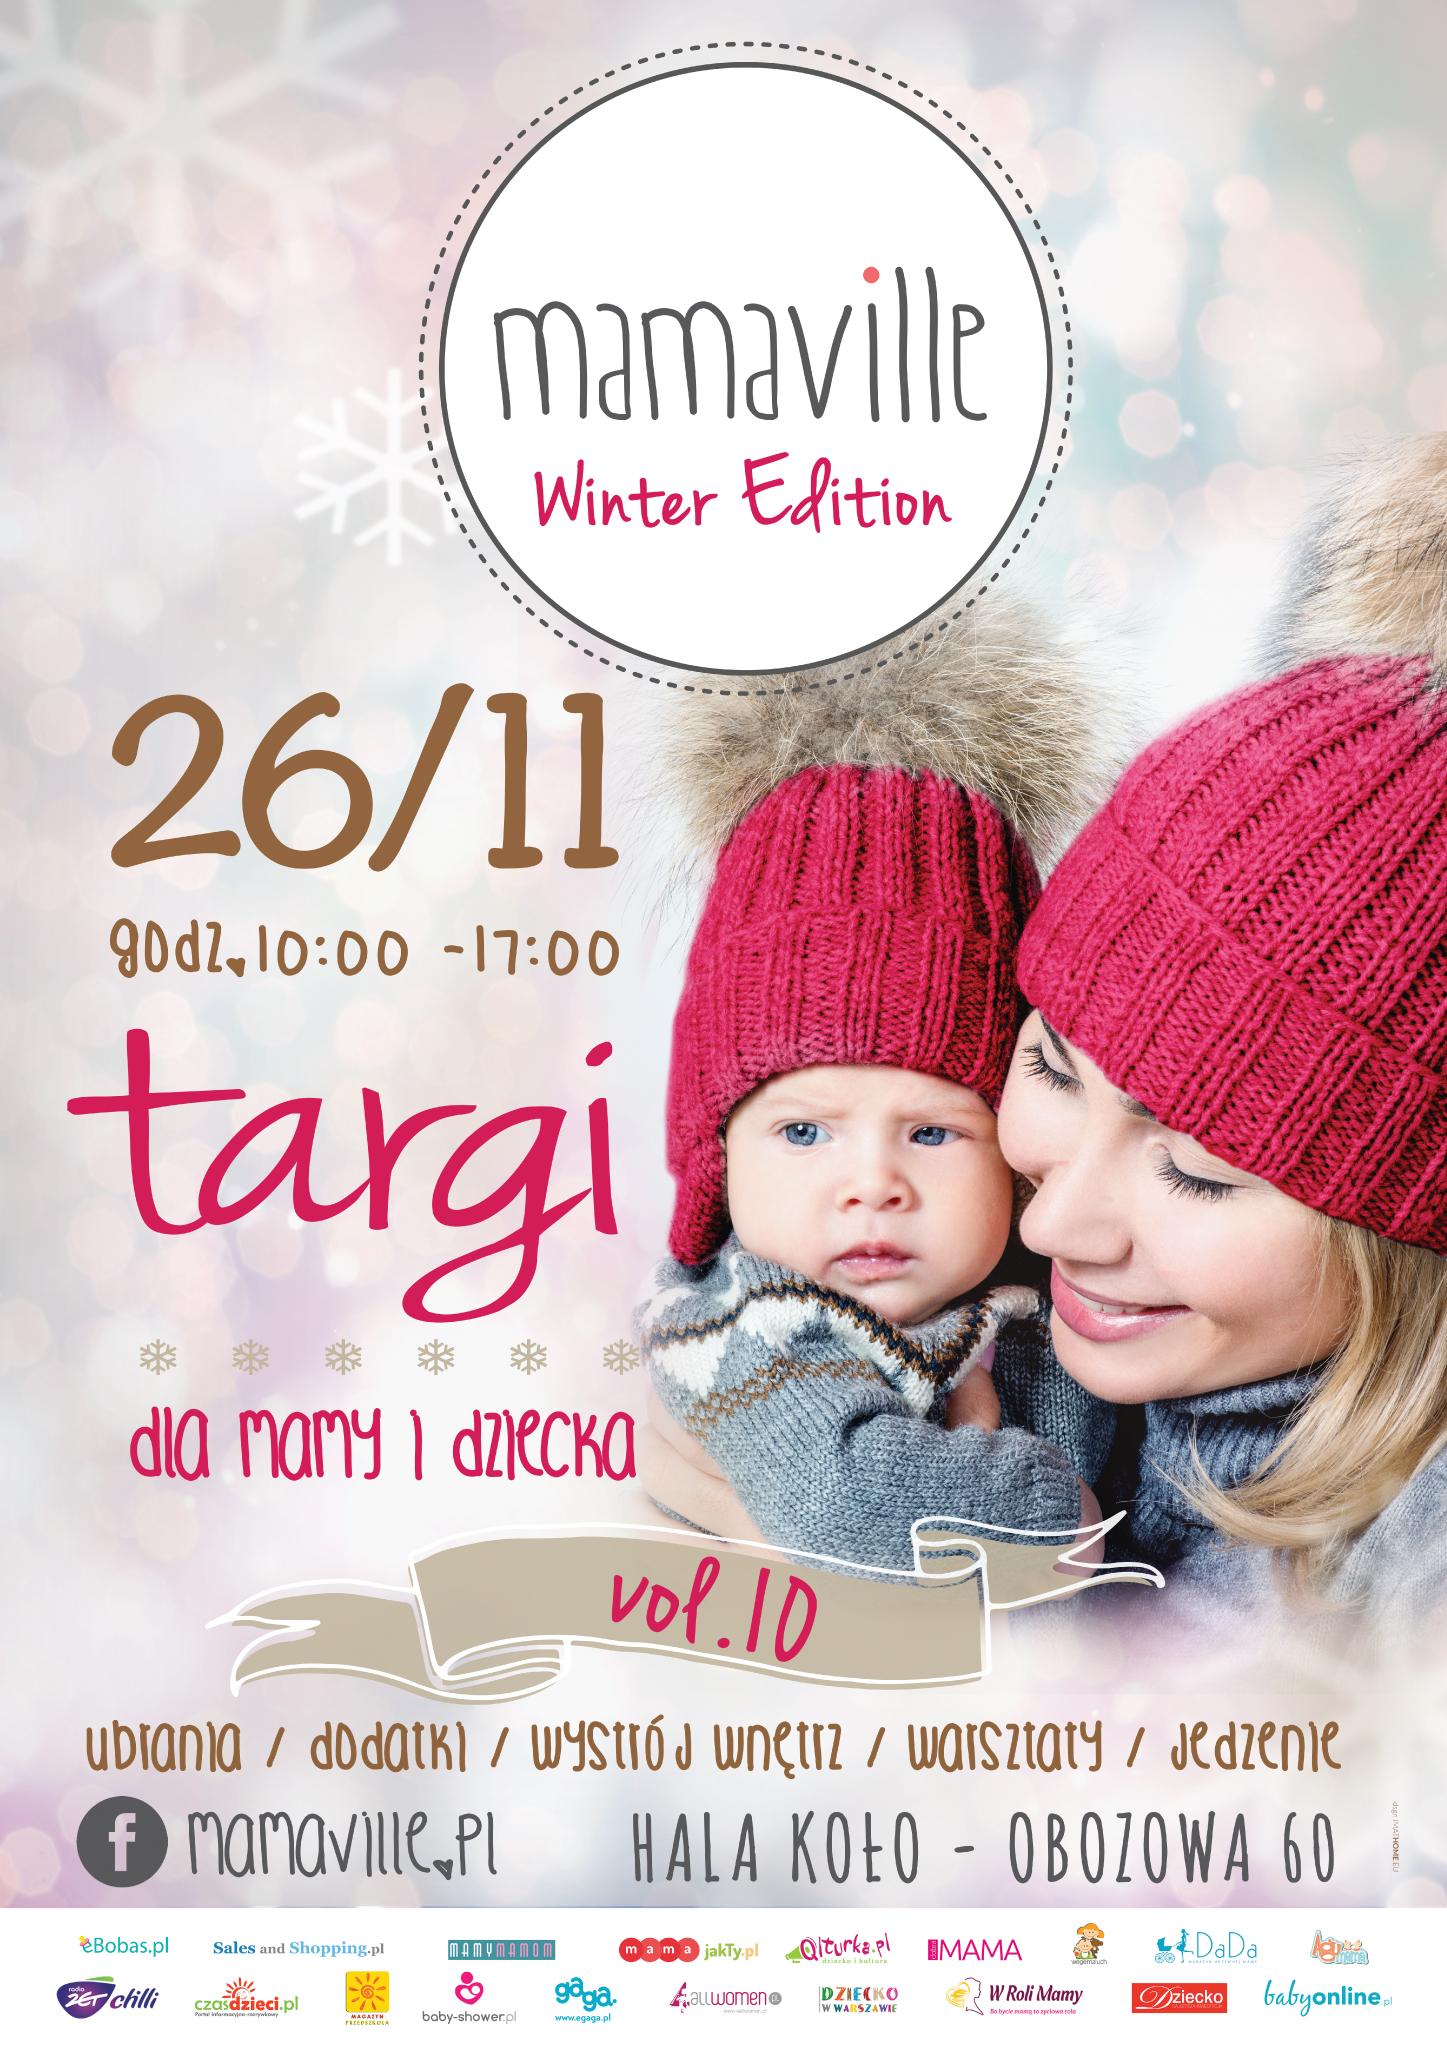 Targi Mamaville w Warszawie 26 listopada 2016